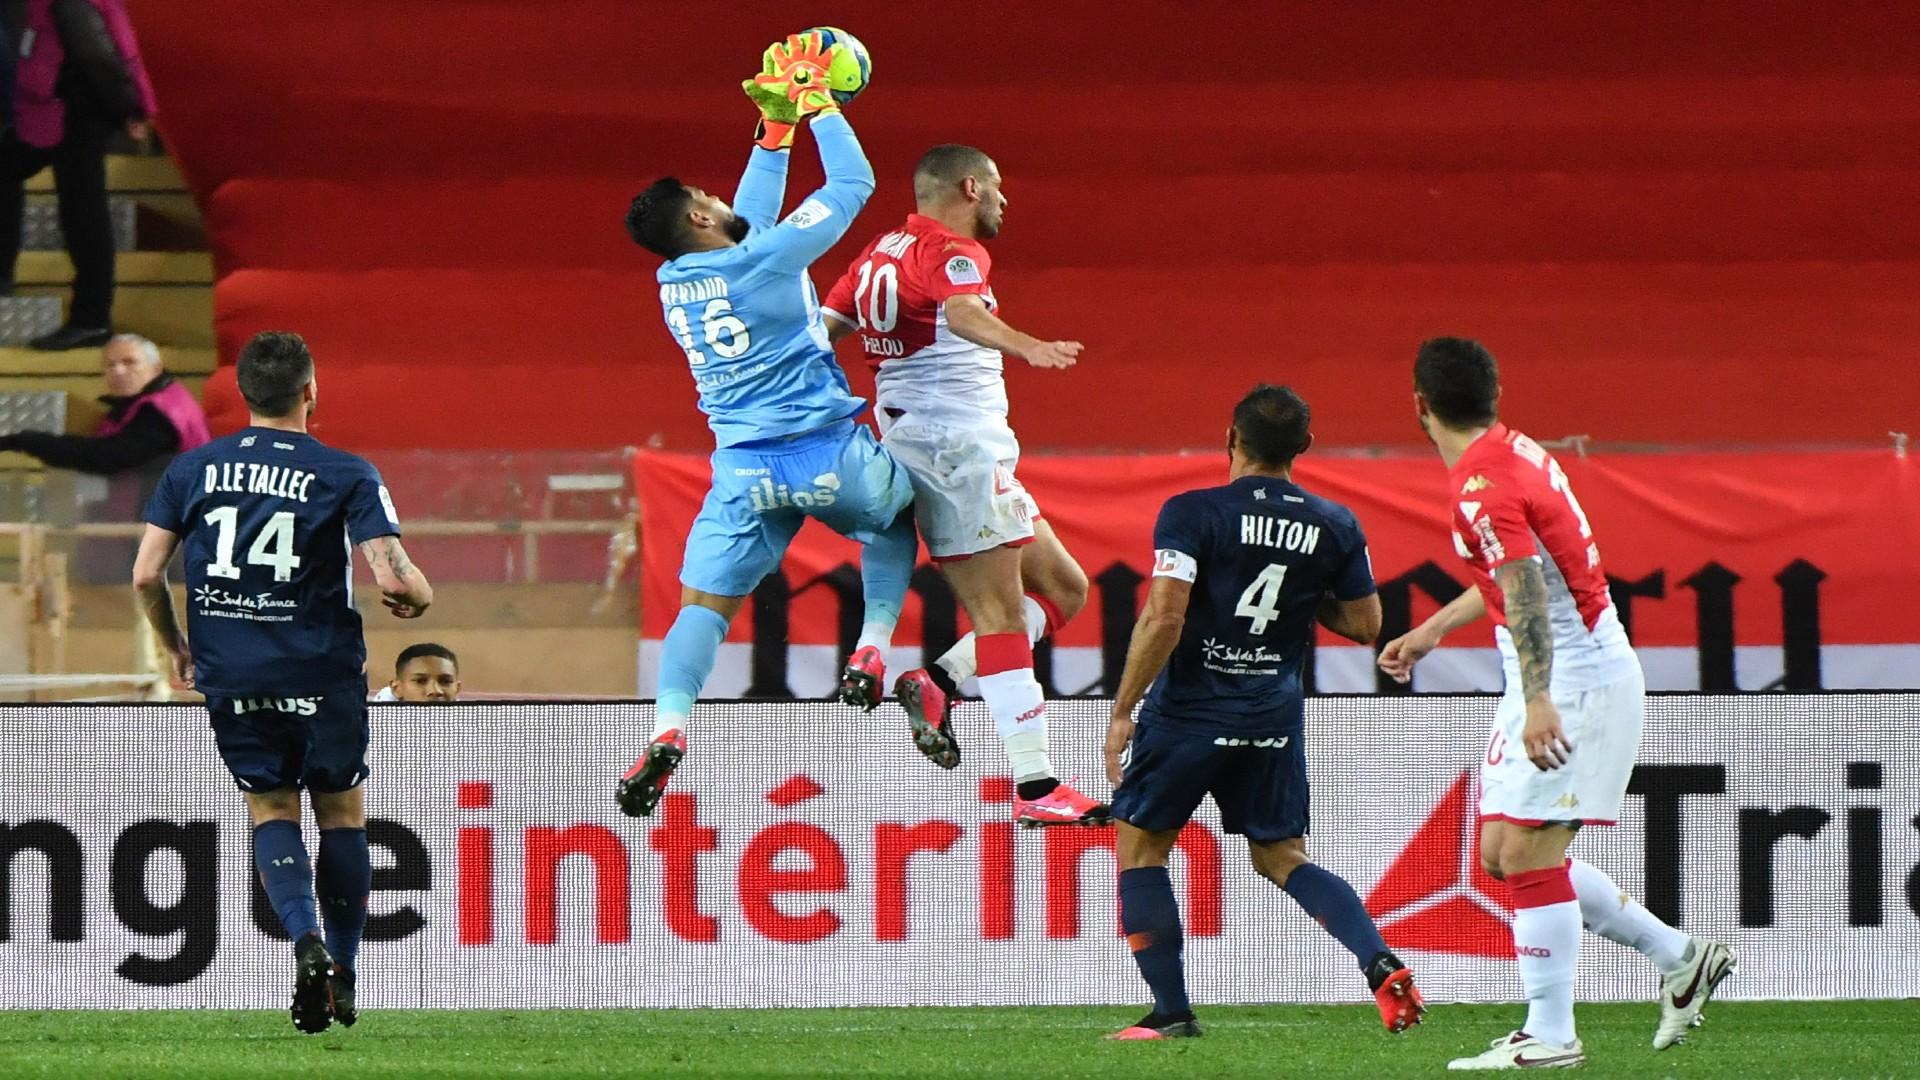 Monaco-Montpellier (1-0) - Slimani fait encore gagner Monaco